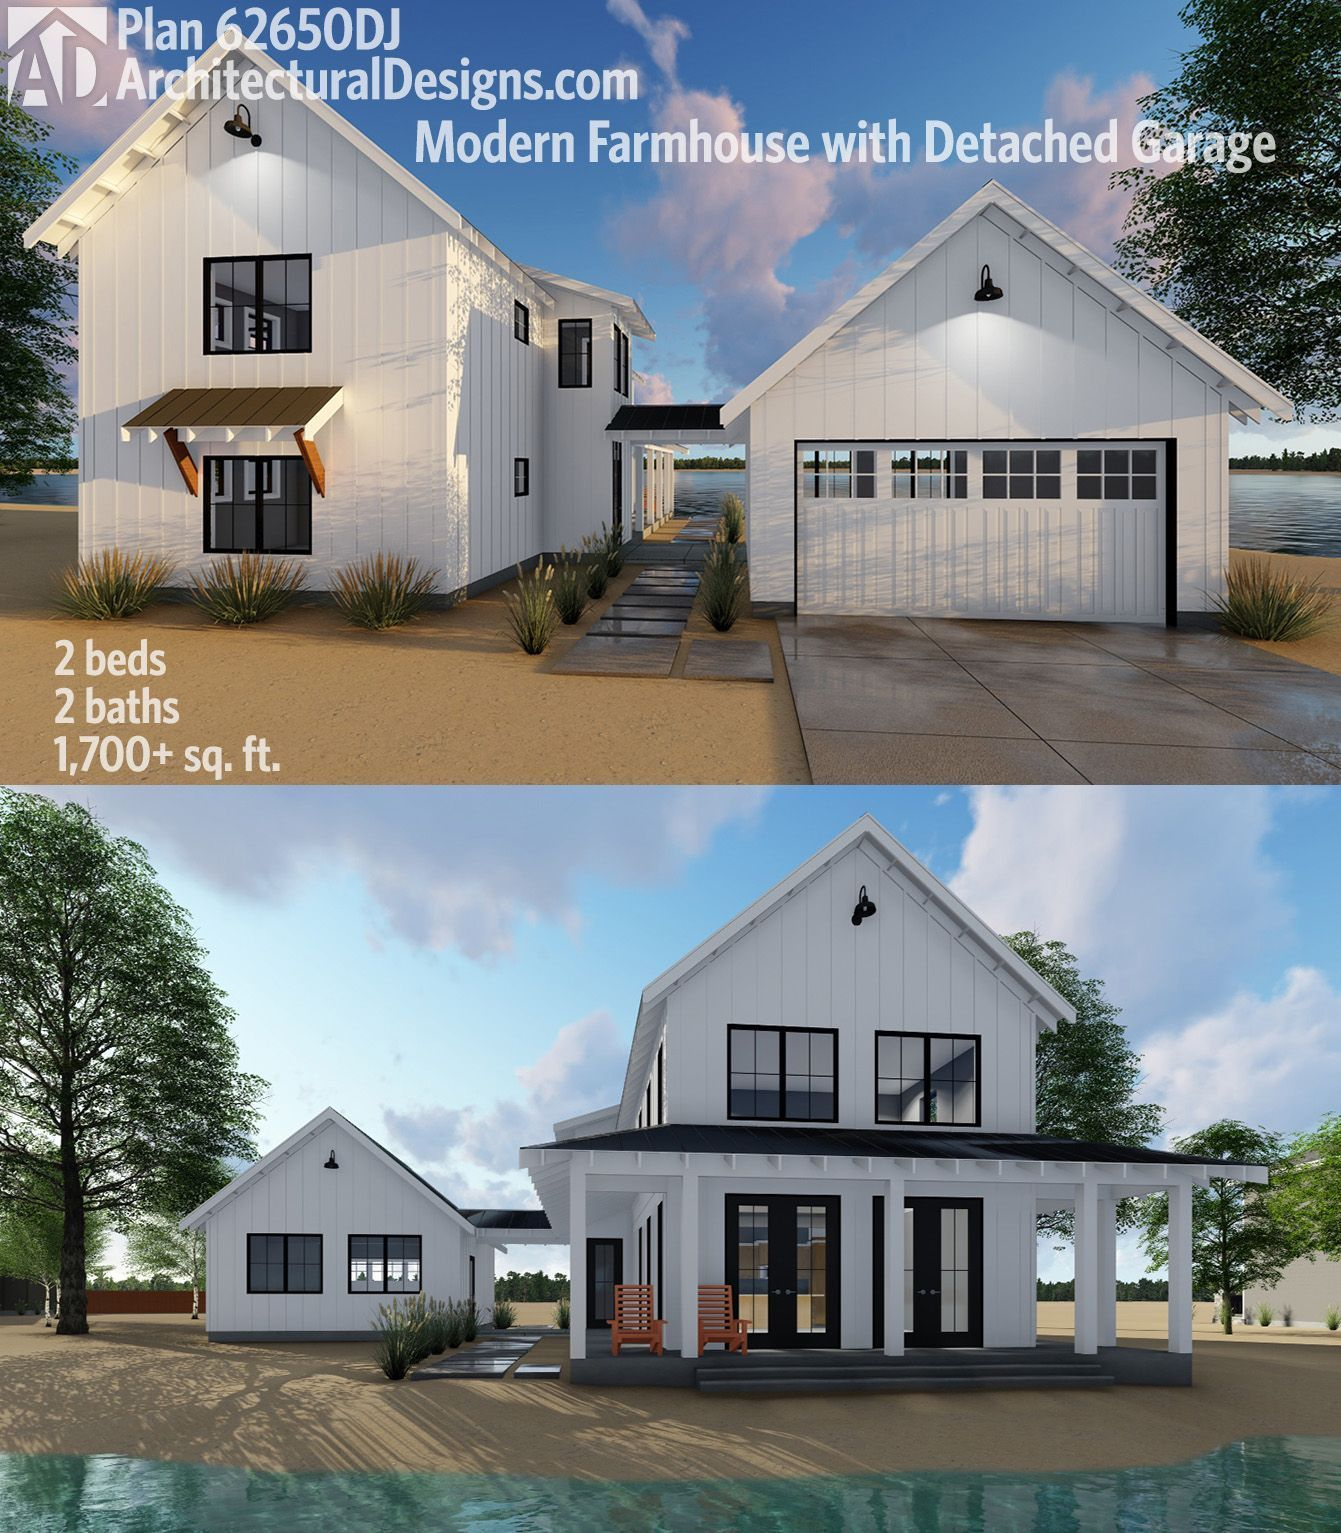 Architectural Designs Modern Farmhouse Plan 62650DJ 2